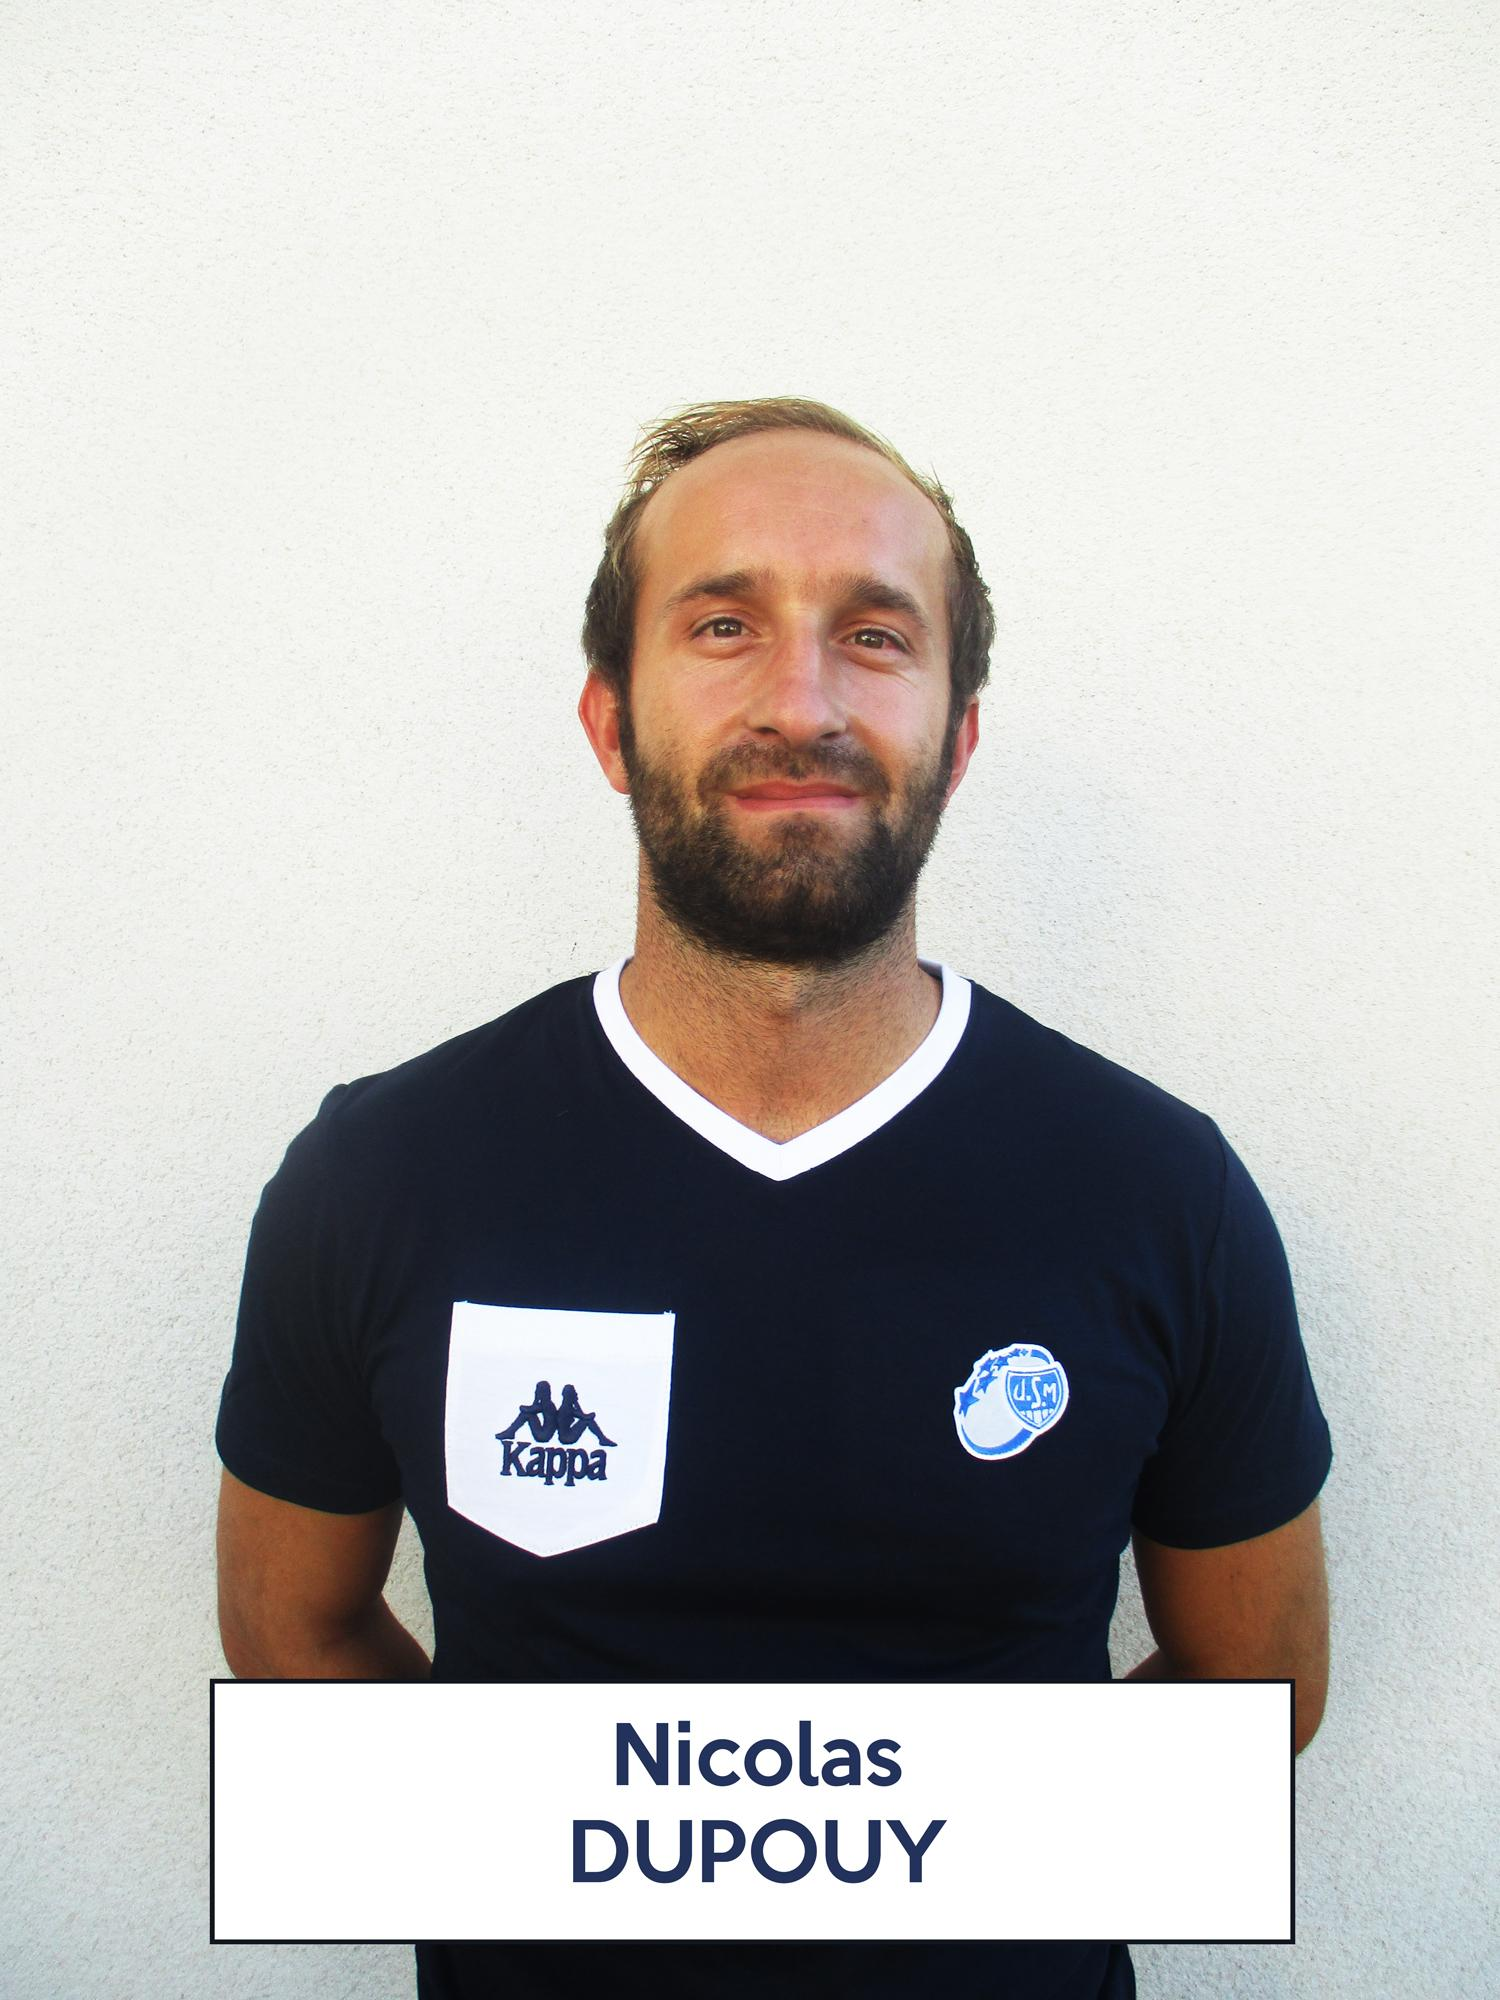 Nicolas Dupouy